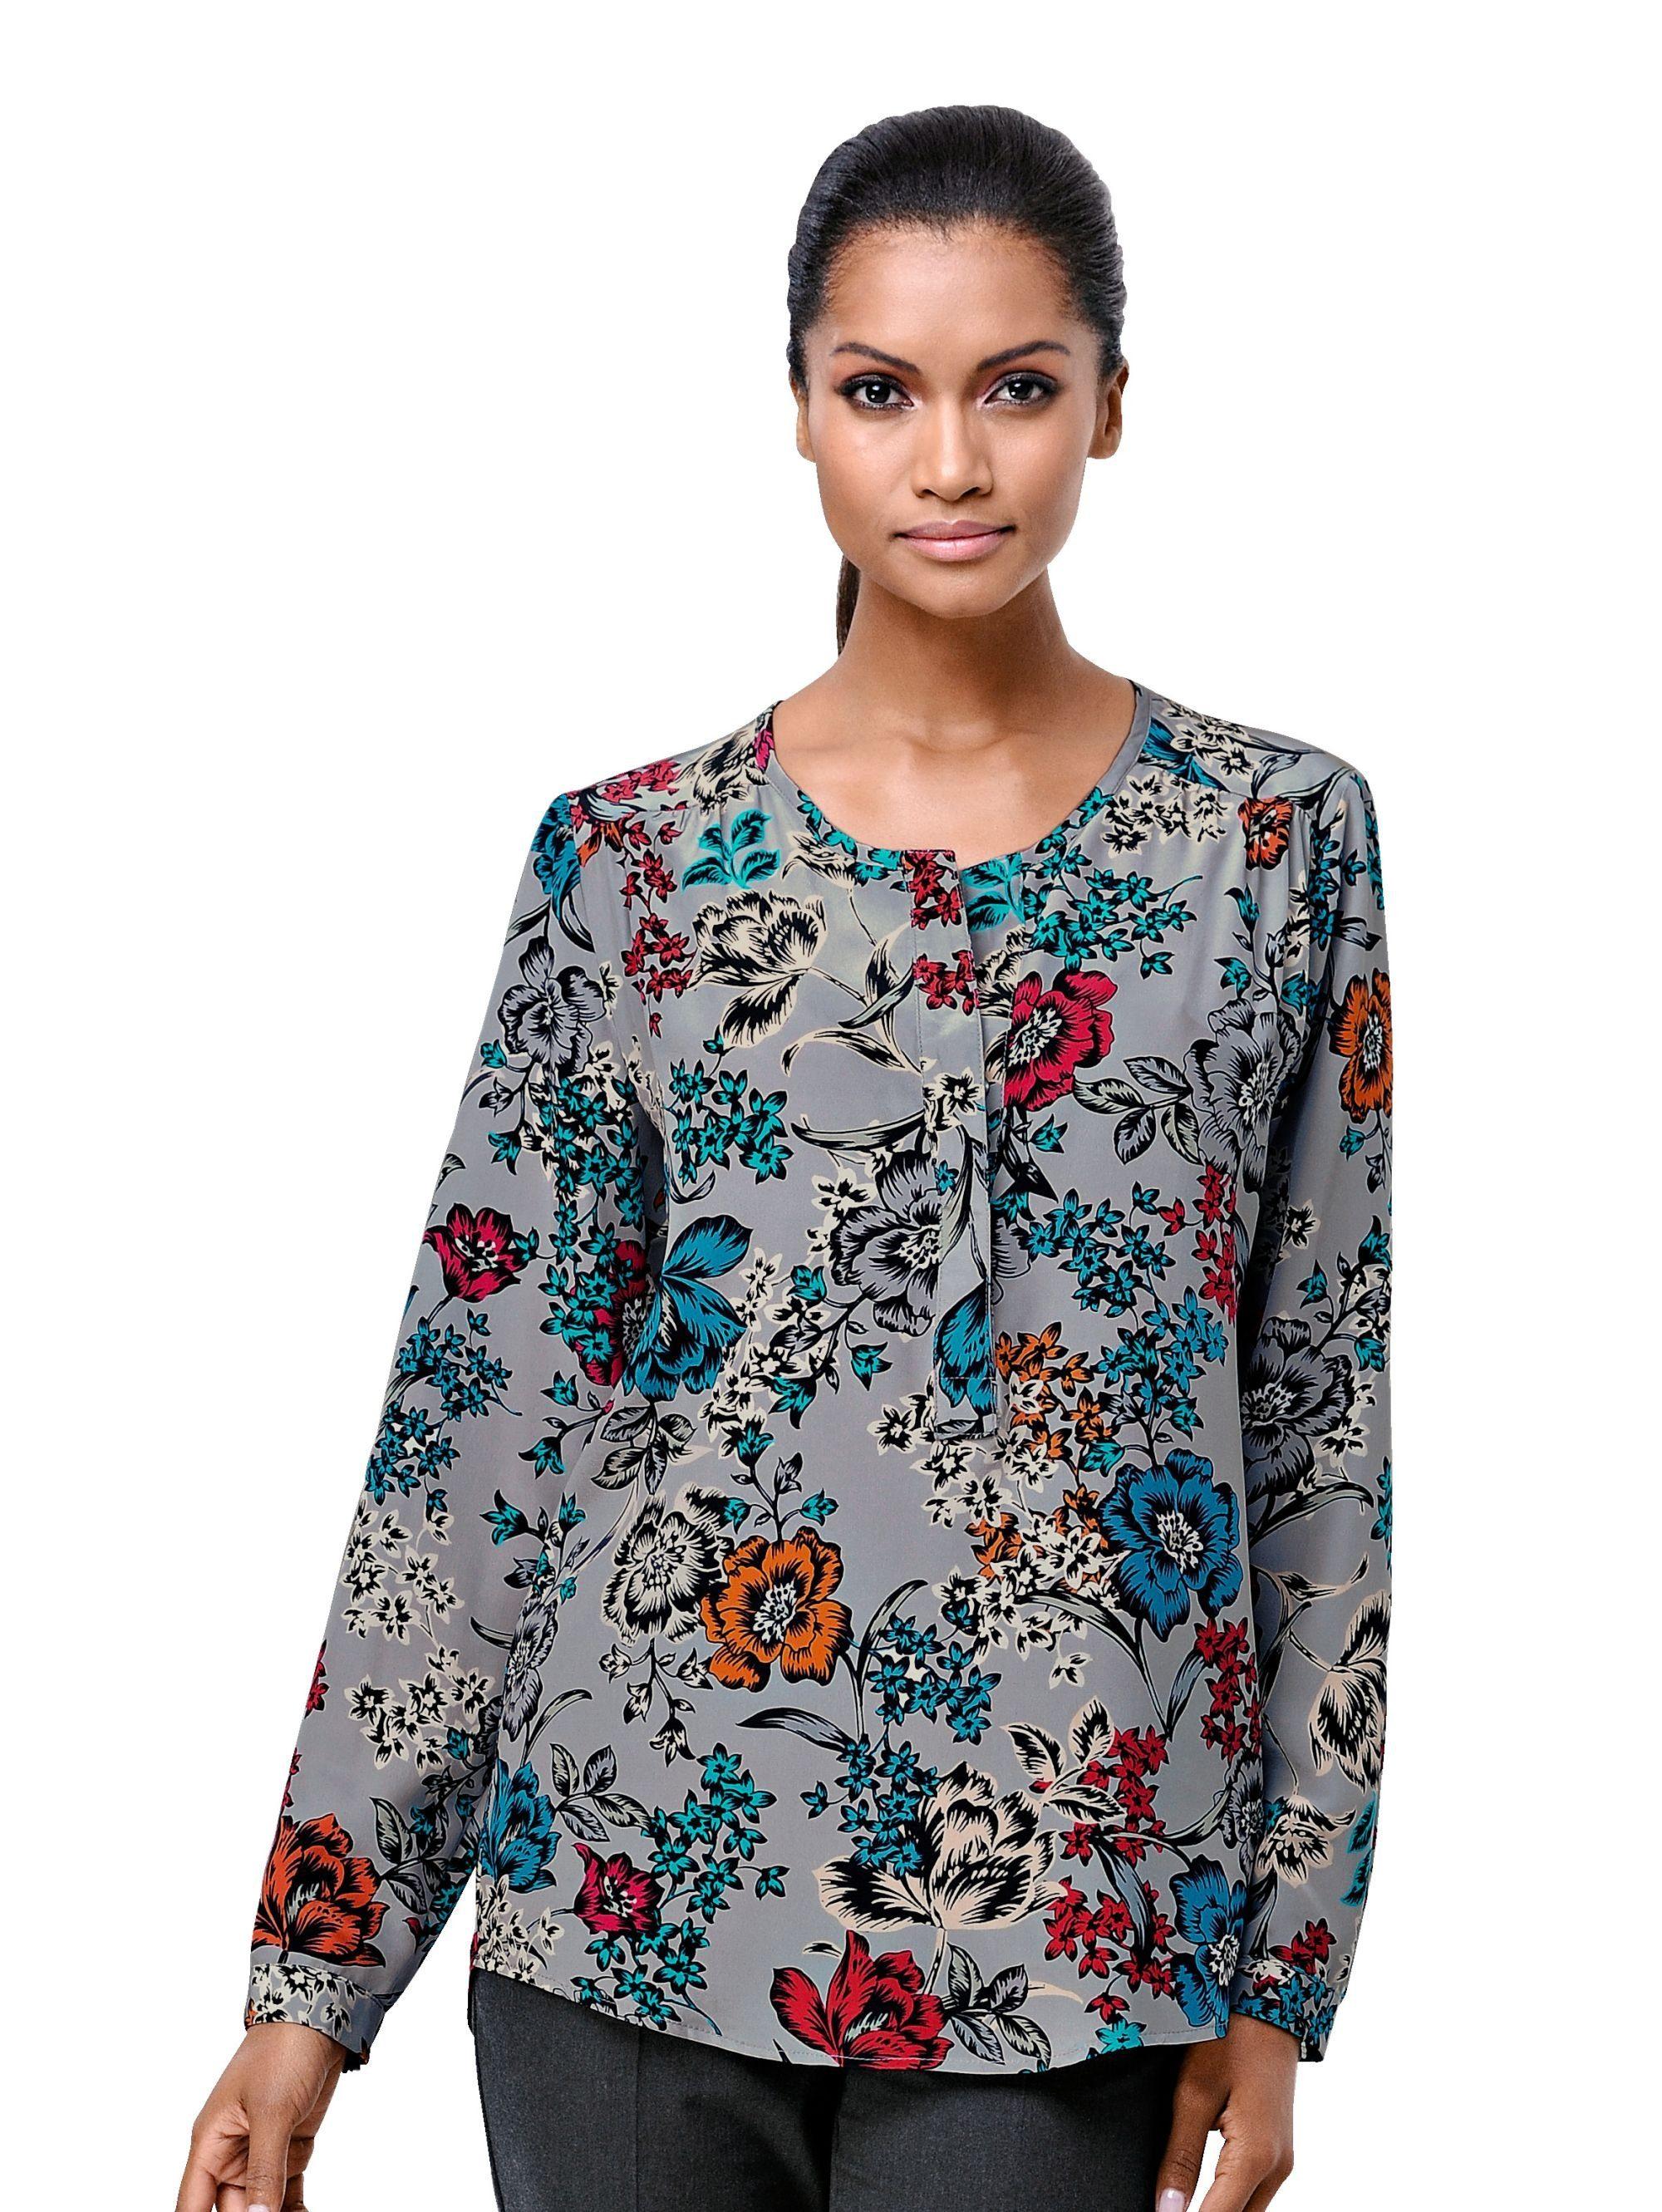 Alba Moda Tunika in edler Seiden-Qualiät mit floralem Print